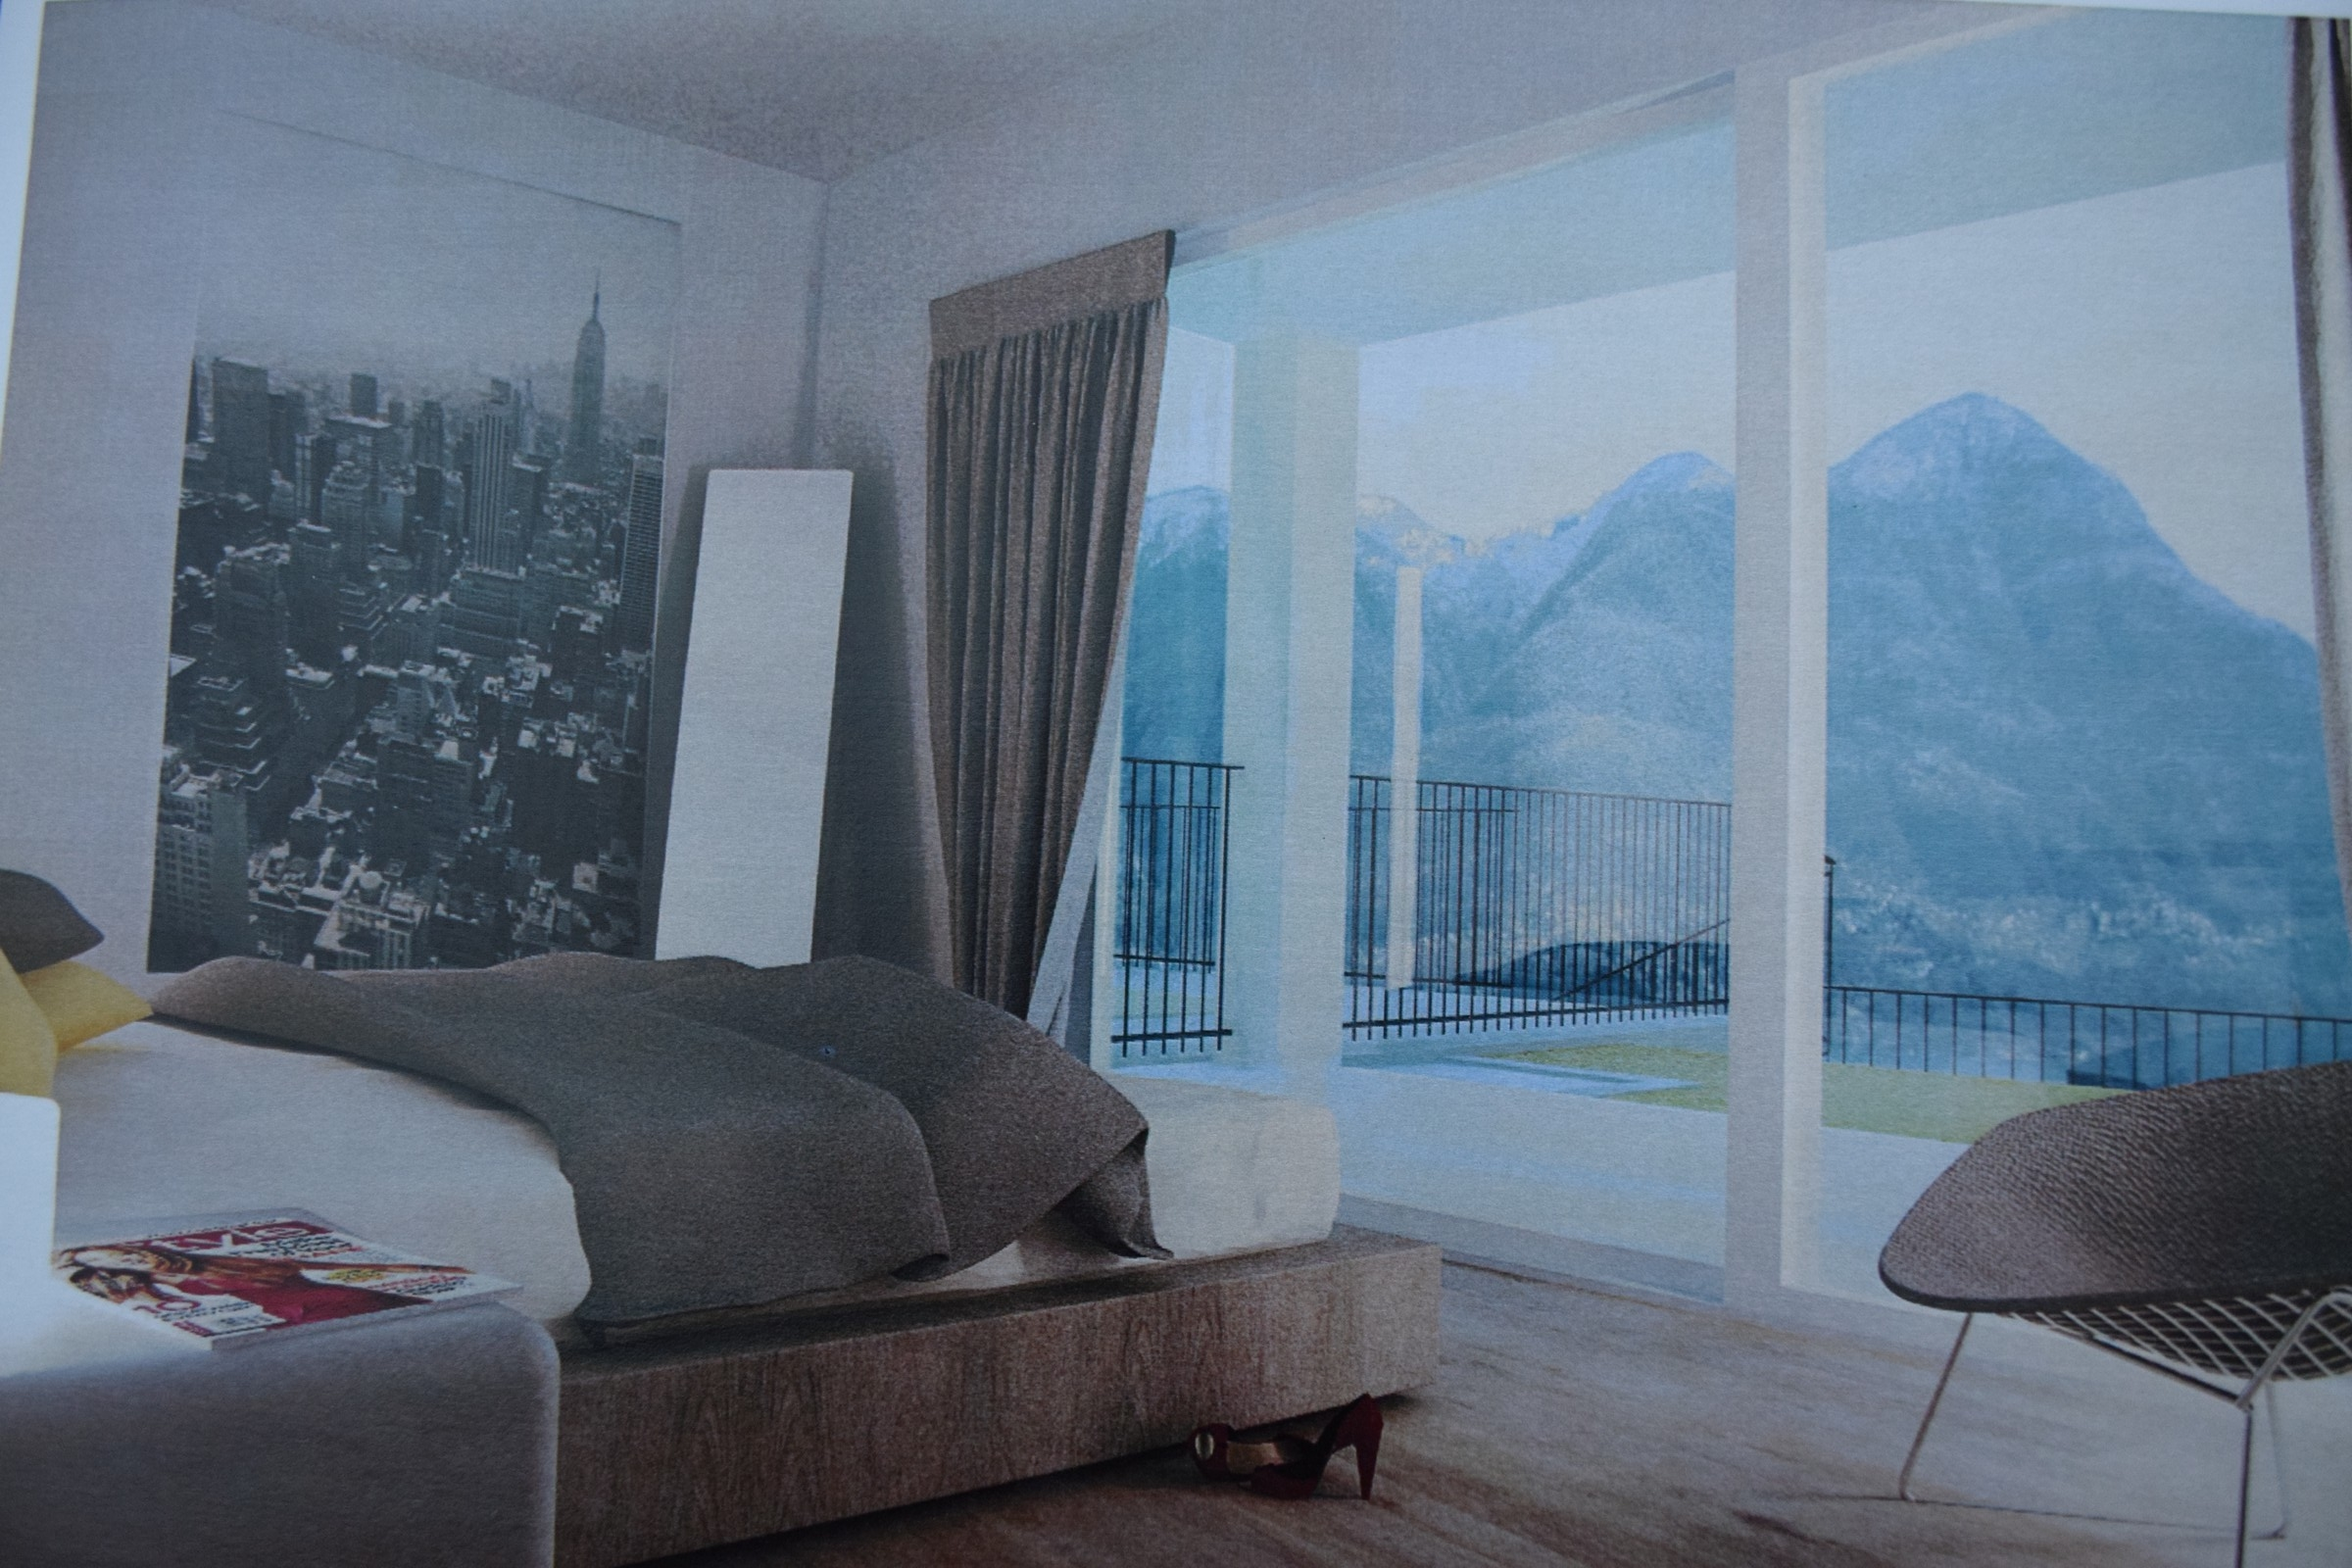 ferienwohnung brissago tessin nr 9 immobilien lago maggiore. Black Bedroom Furniture Sets. Home Design Ideas